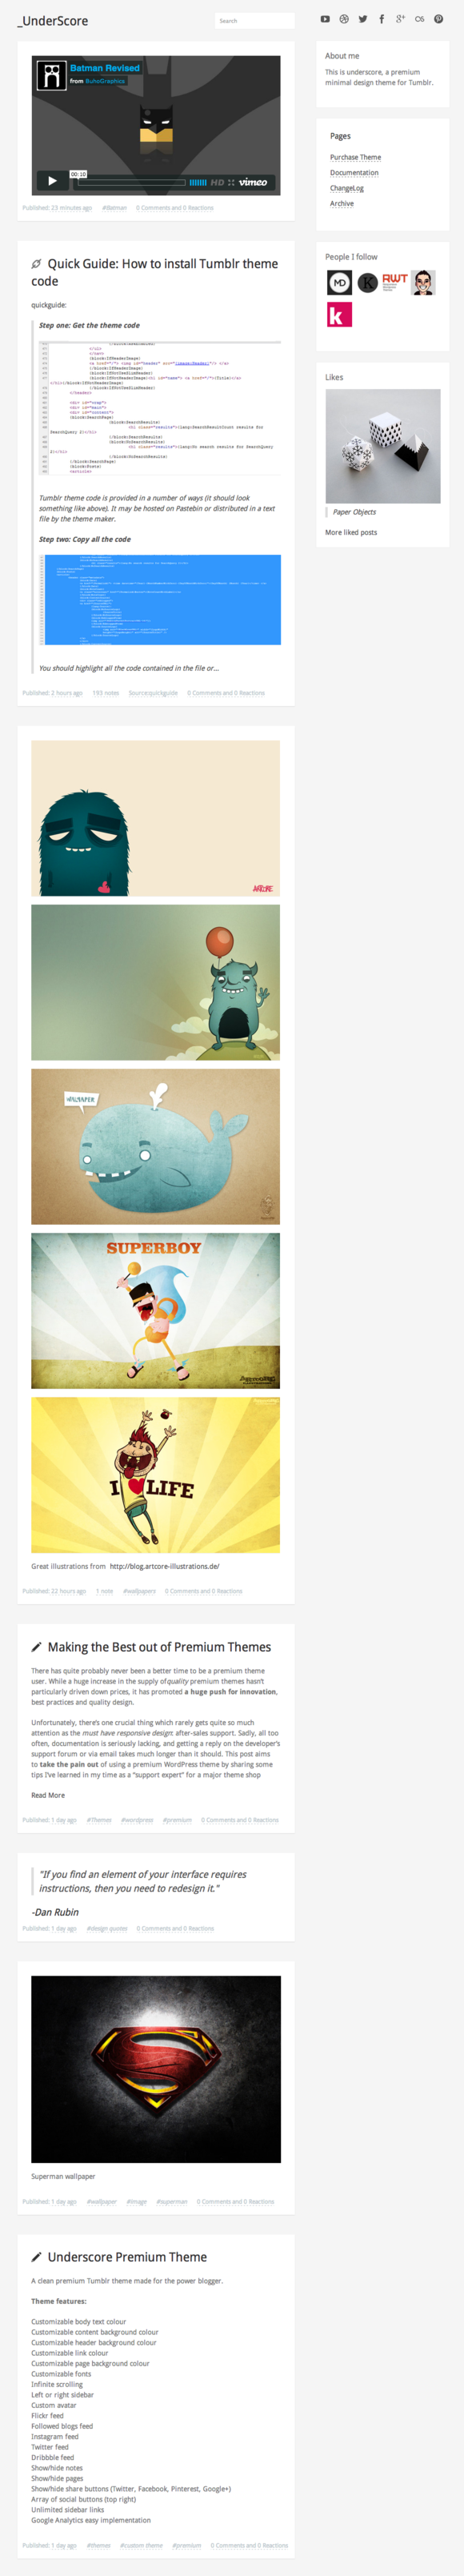 Underscore Tumblr Theme